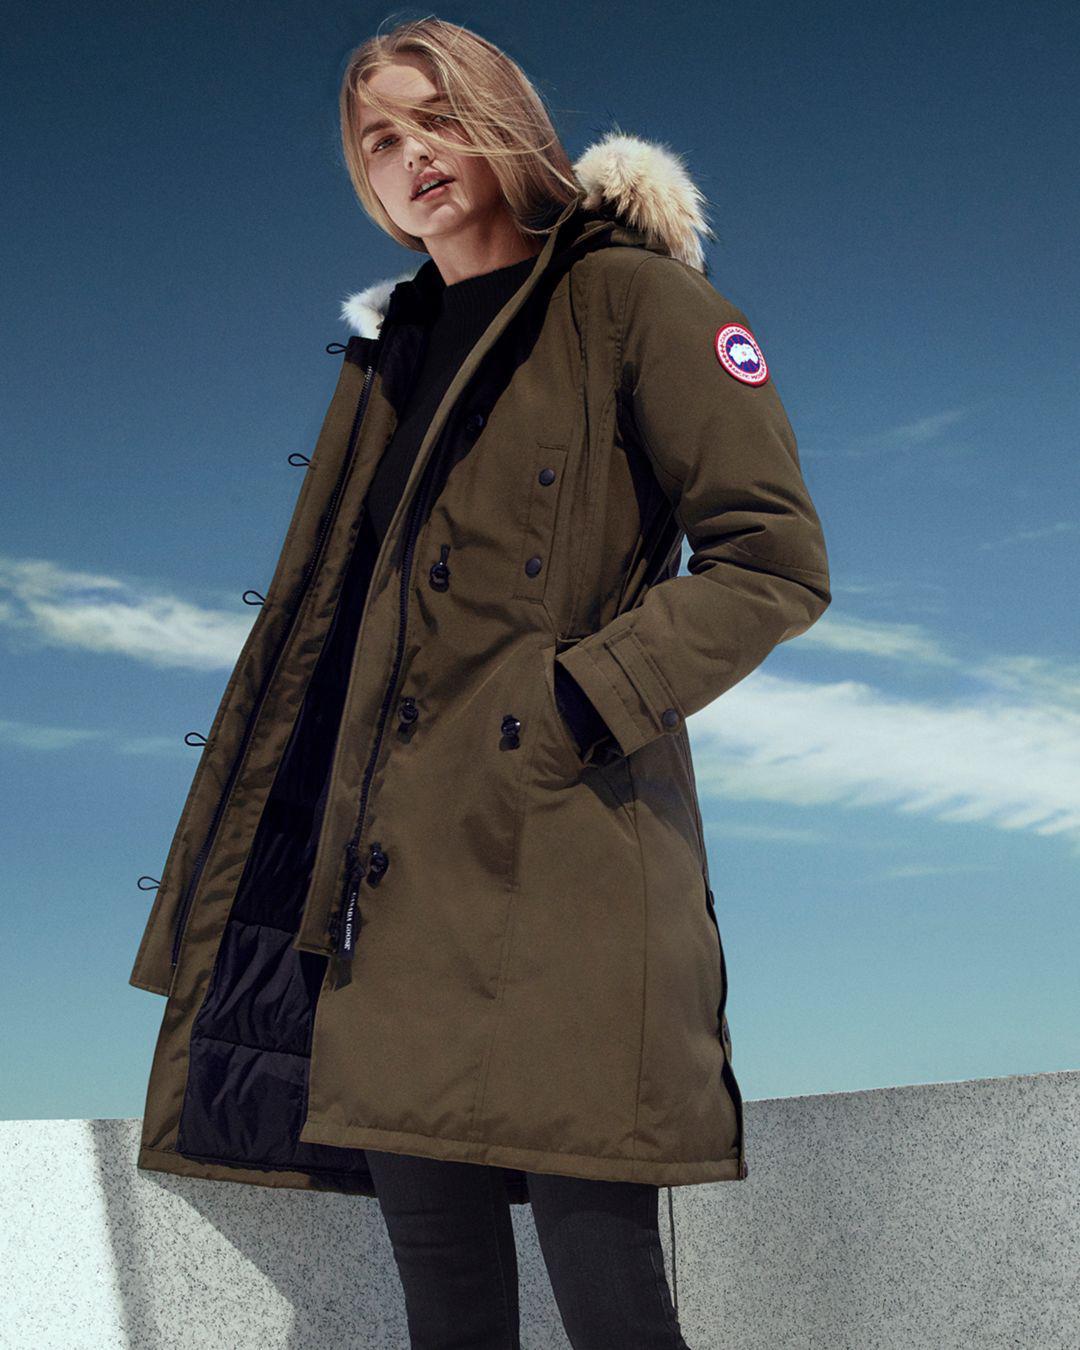 Lyst - Canada Goose Kensington Long Fur-trimmed Down Parka Jacket in Green